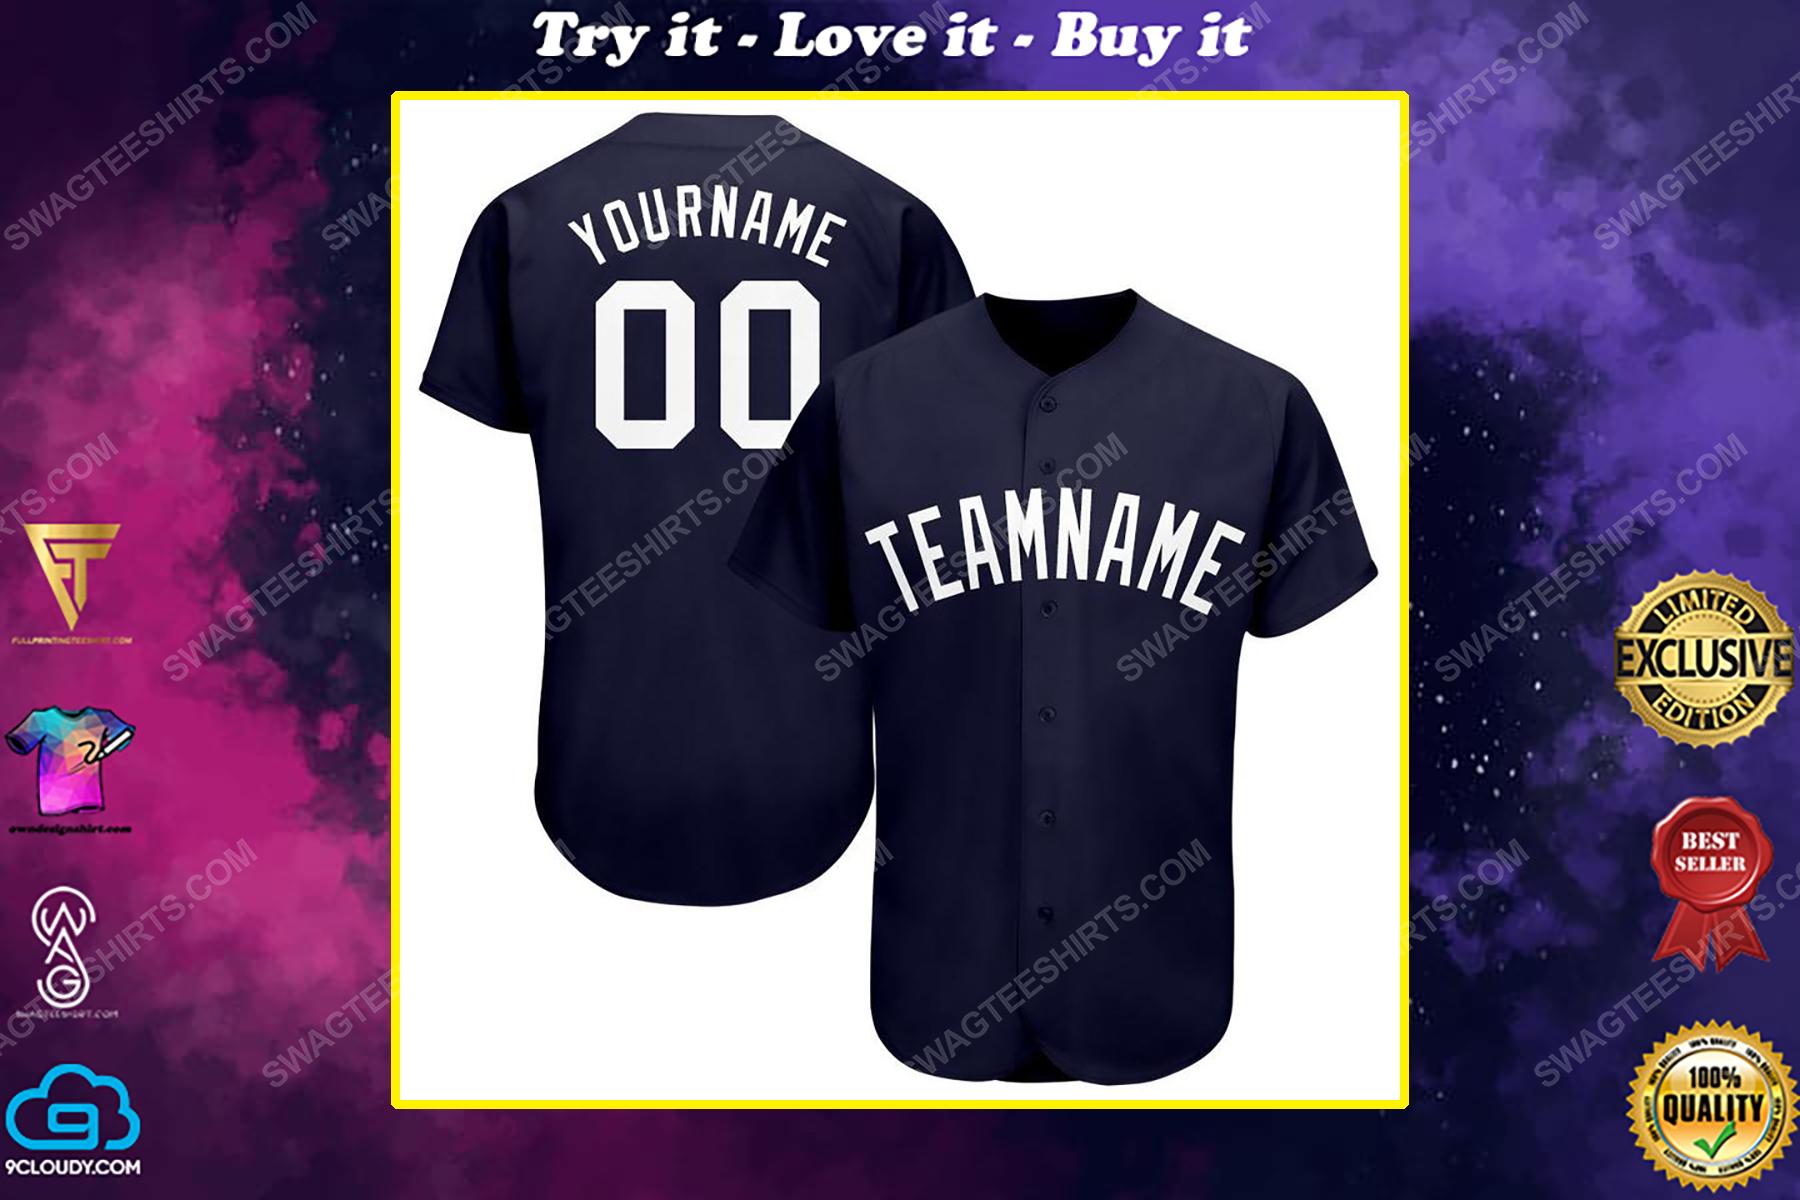 Custom team name new york yankees logo full printed baseball jersey